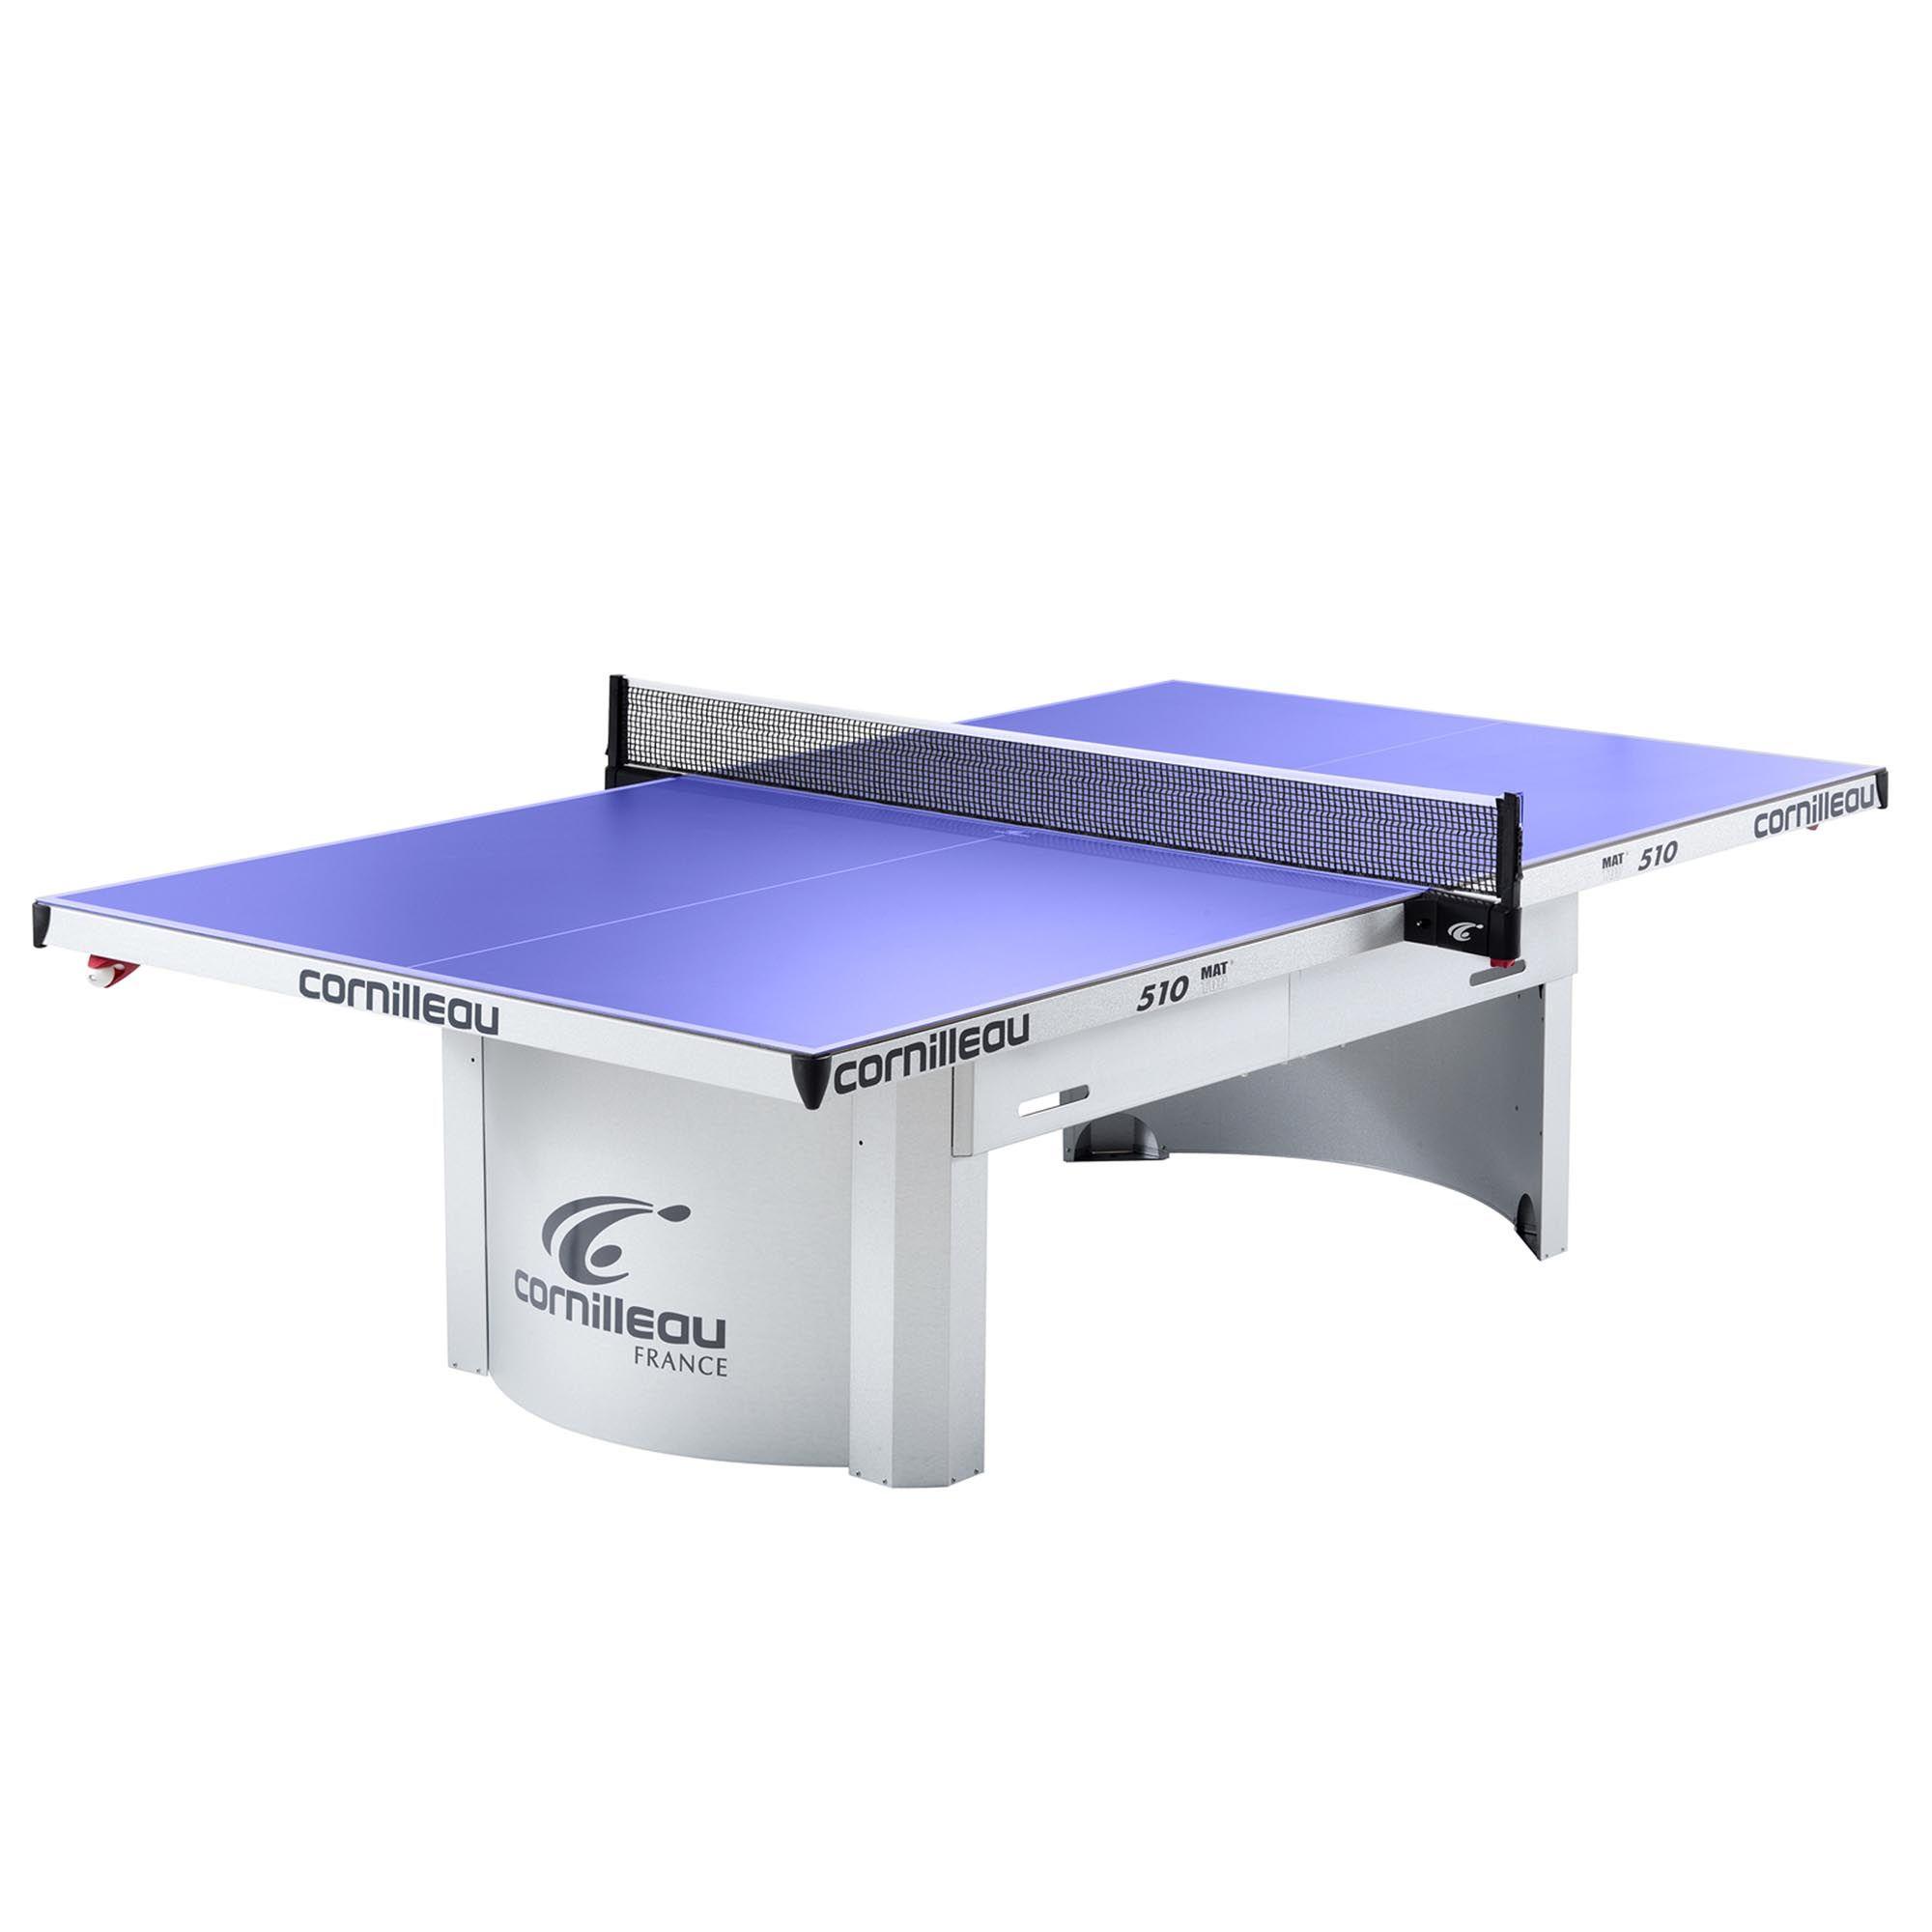 Cornilleau pro 510 static outdoor table tennis table - Used outdoor table tennis tables for sale ...